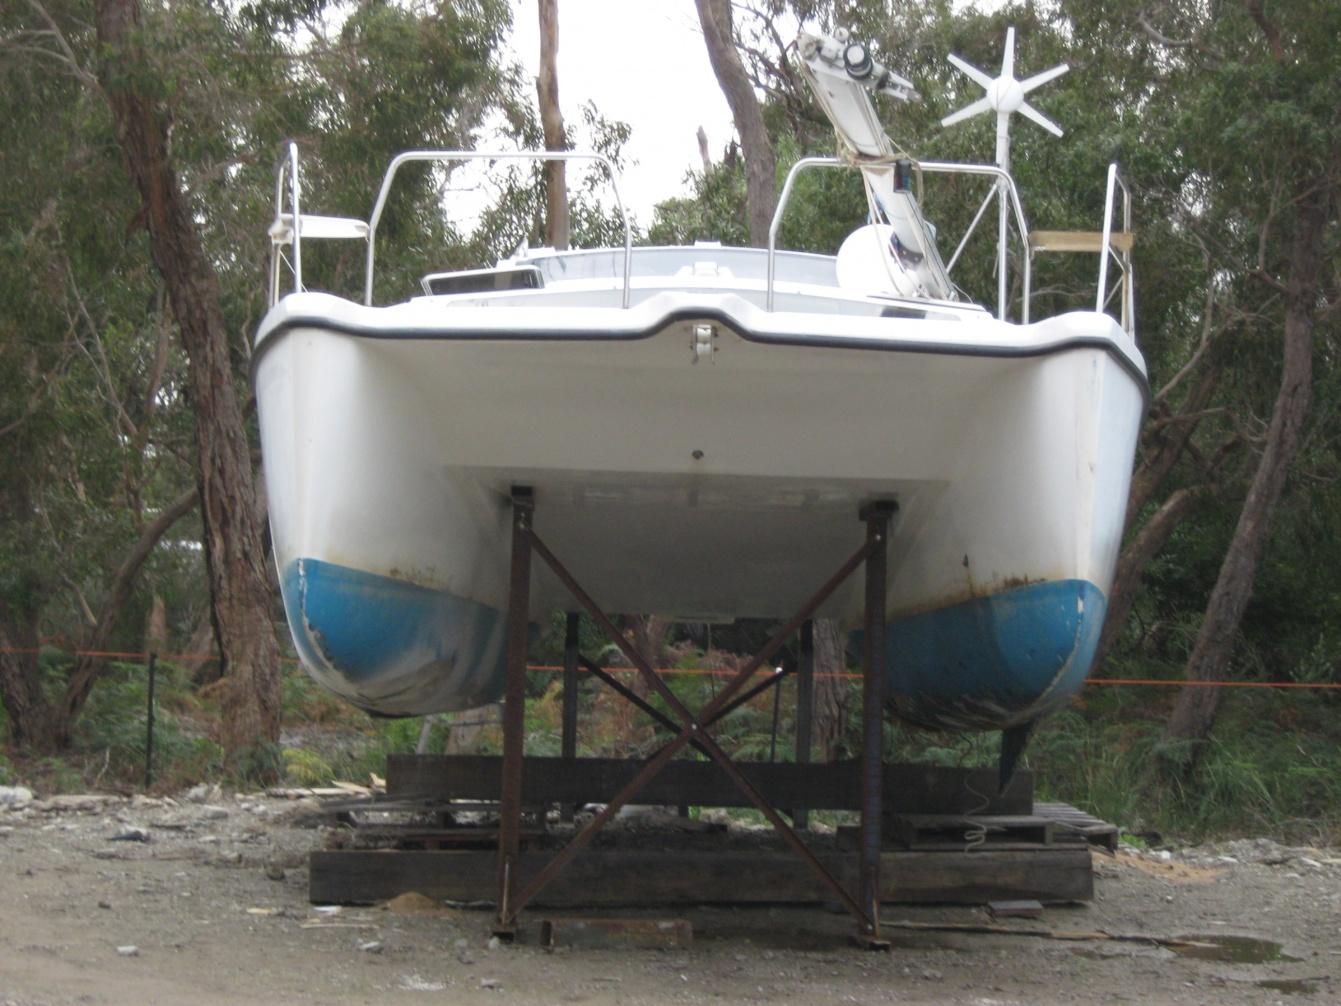 Click image for larger version  Name:Boat repairs in progress at Yaringa. June 2012 007.jpg Views:144 Size:424.3 KB ID:42451